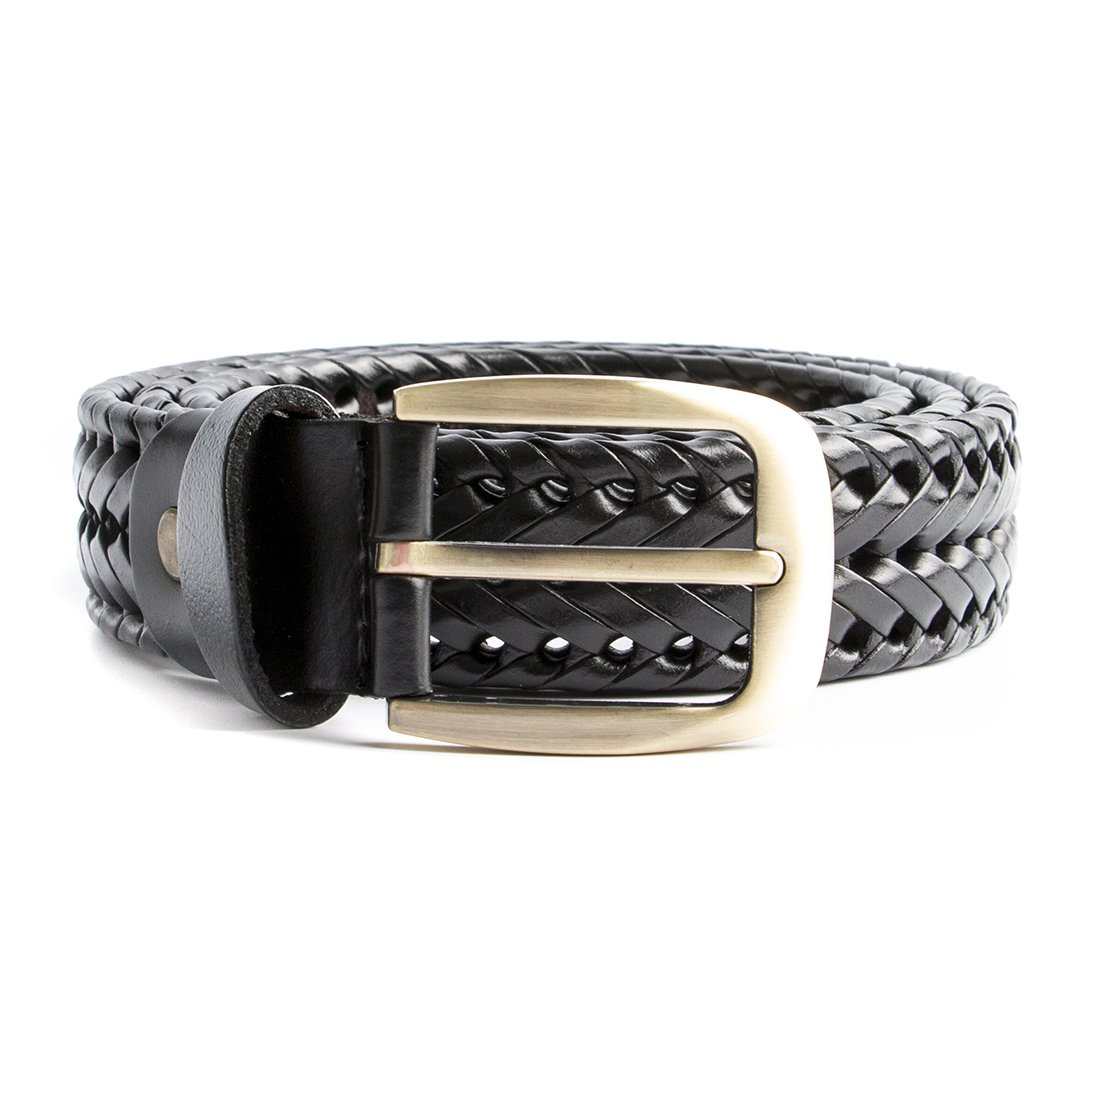 ECHAIN Women Braided Woven Genuine Leather Belt